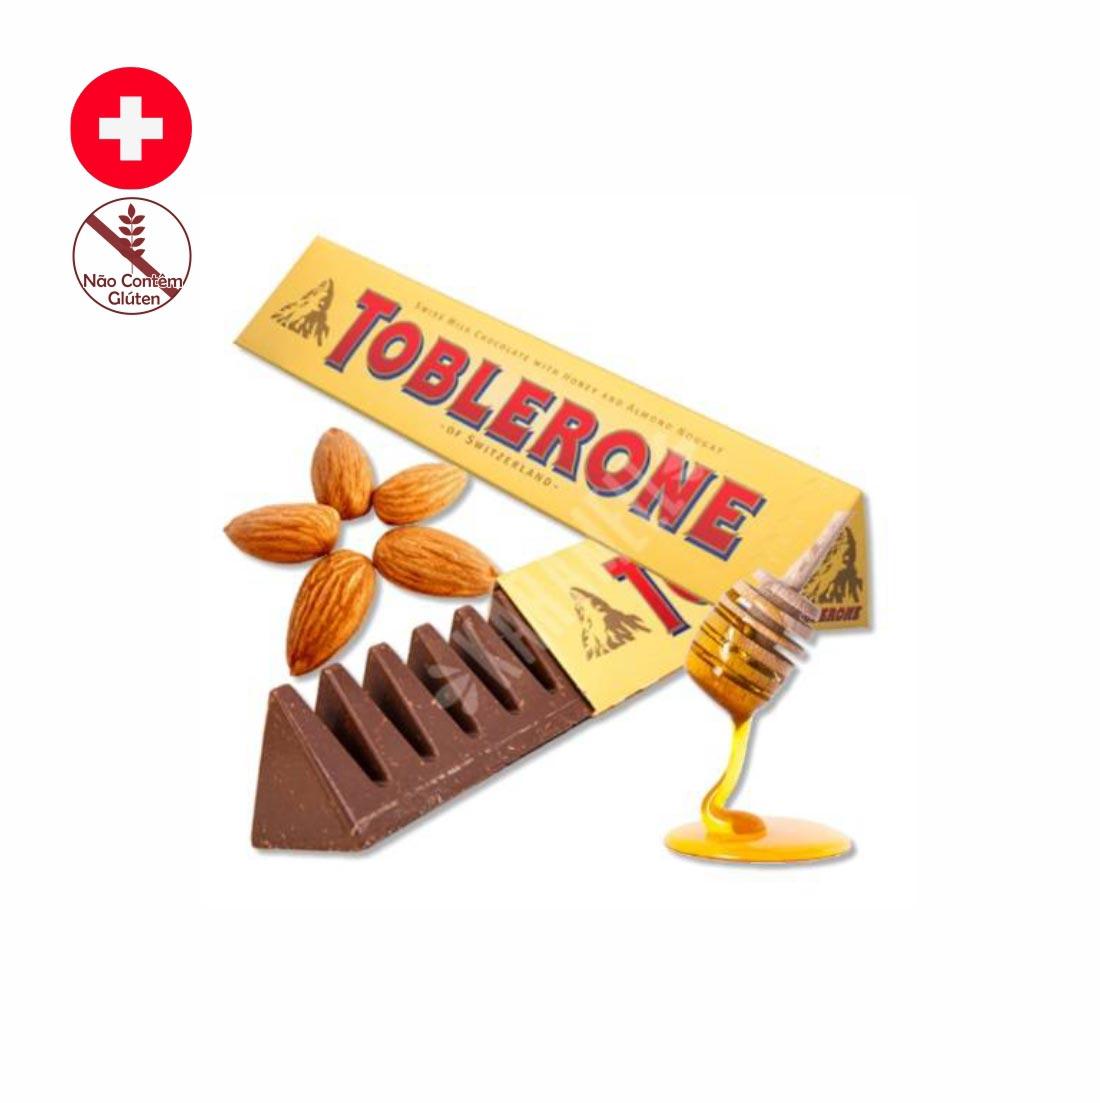 CHOCOLATE TOBLERONE MEL & AMENDOAS 100G